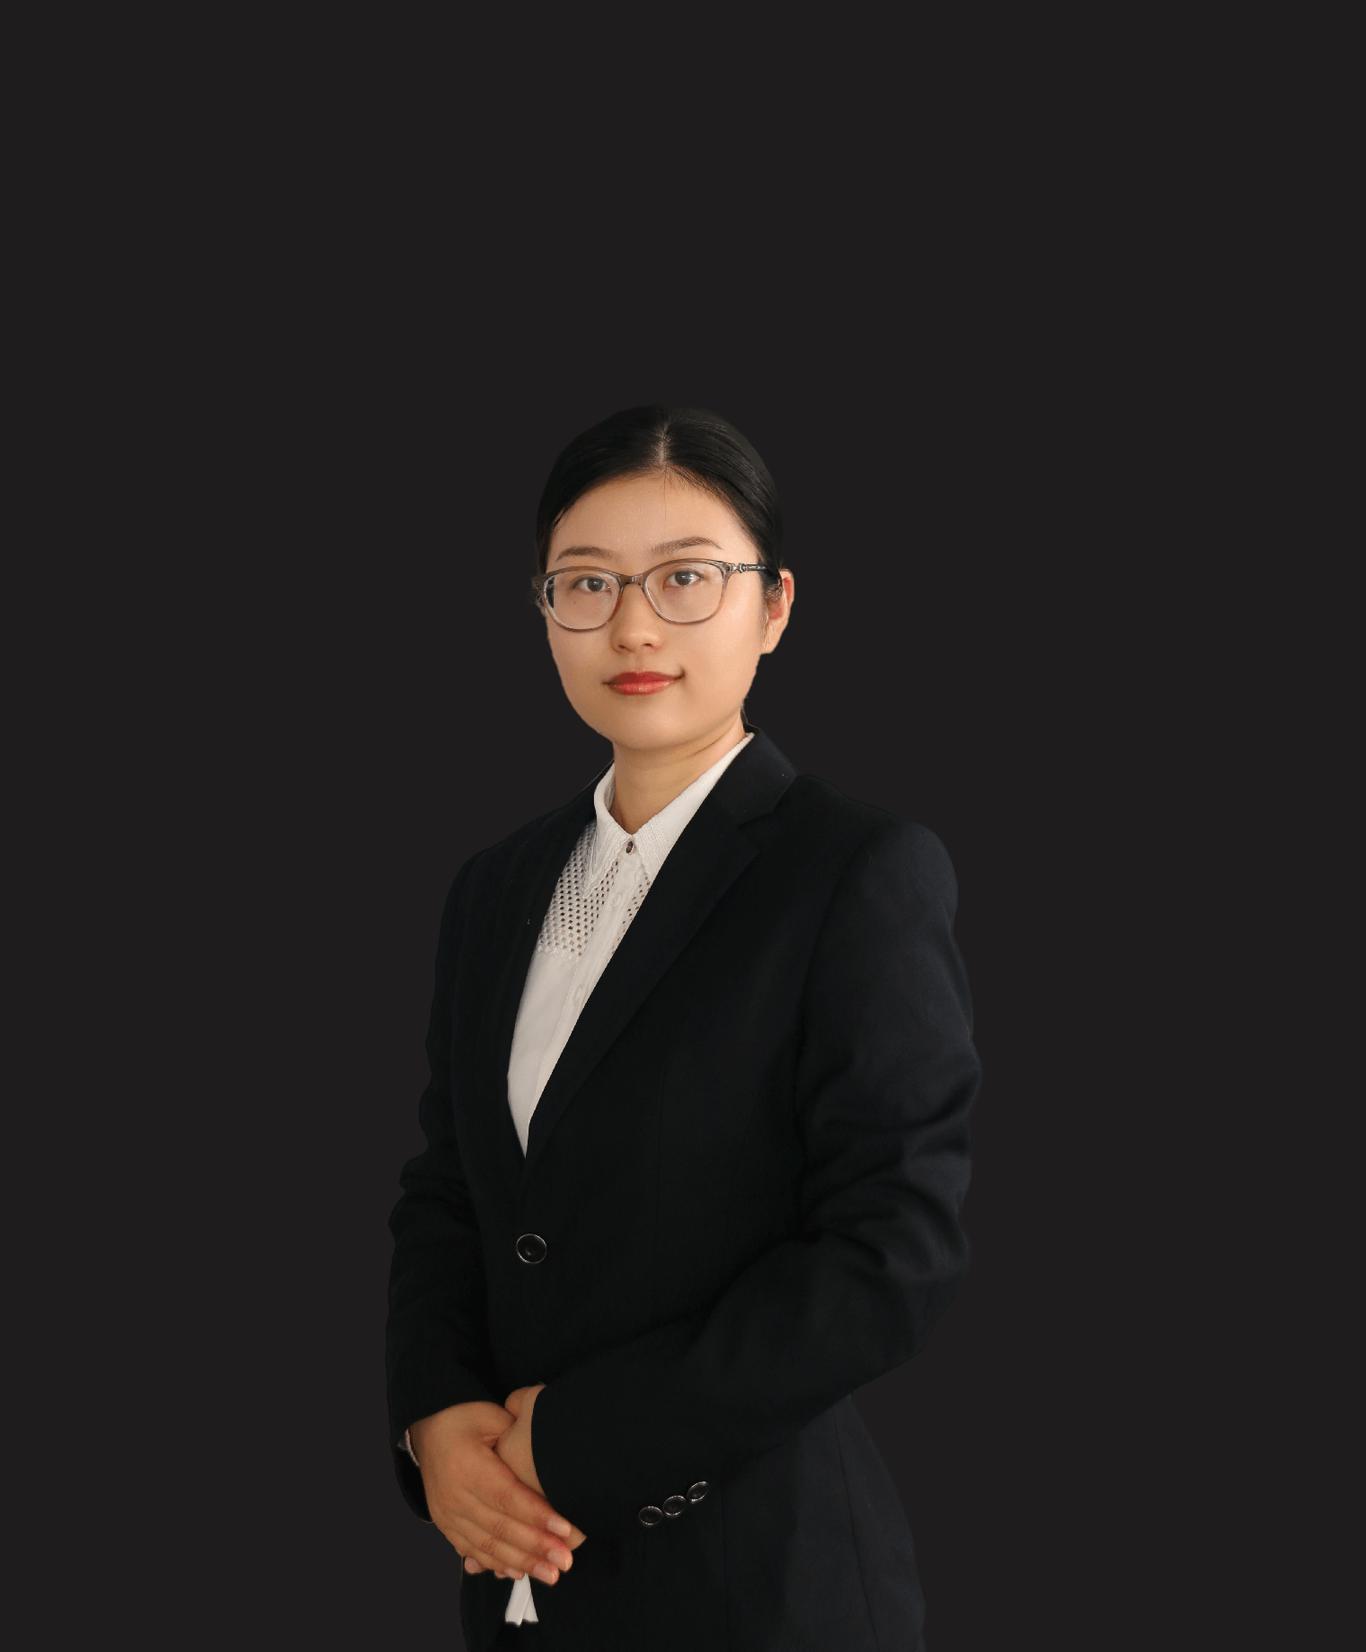 袁慧娟.png